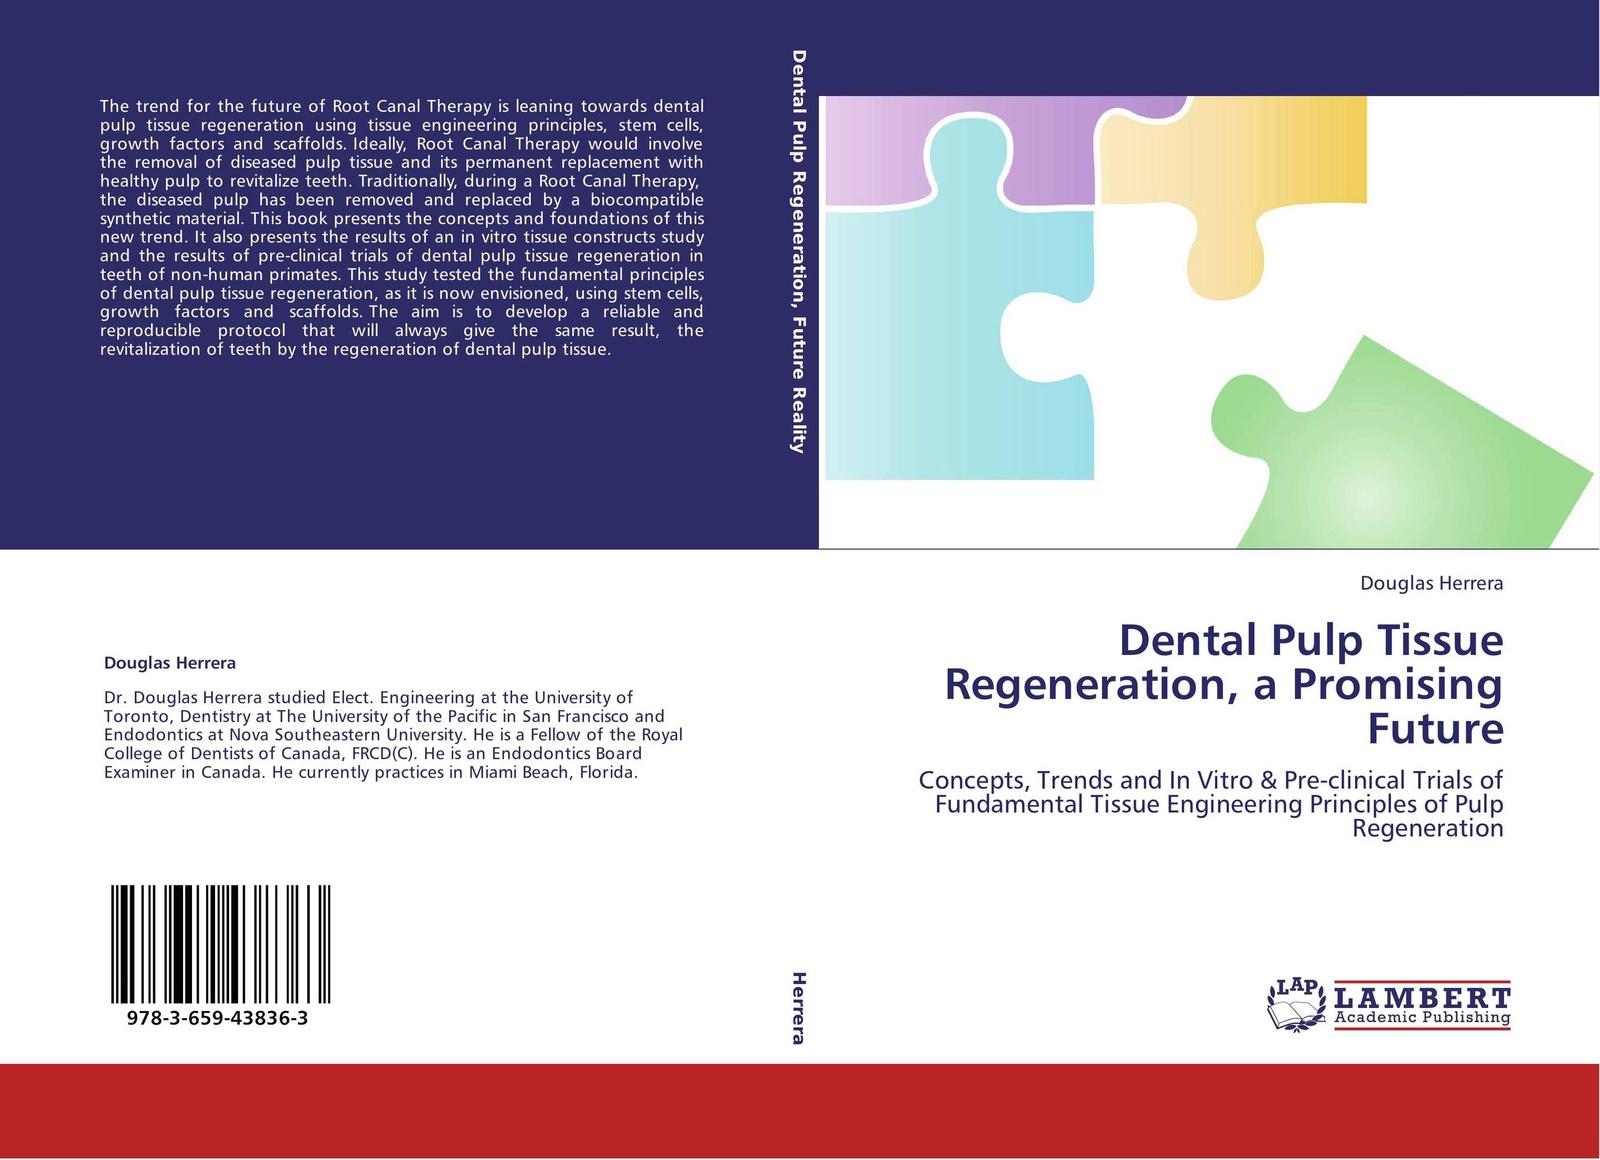 Douglas Herrera Dental Pulp Tissue Regeneration, a Promising Future new dental tray disposable cup storage holder paper tissue box for dental chair